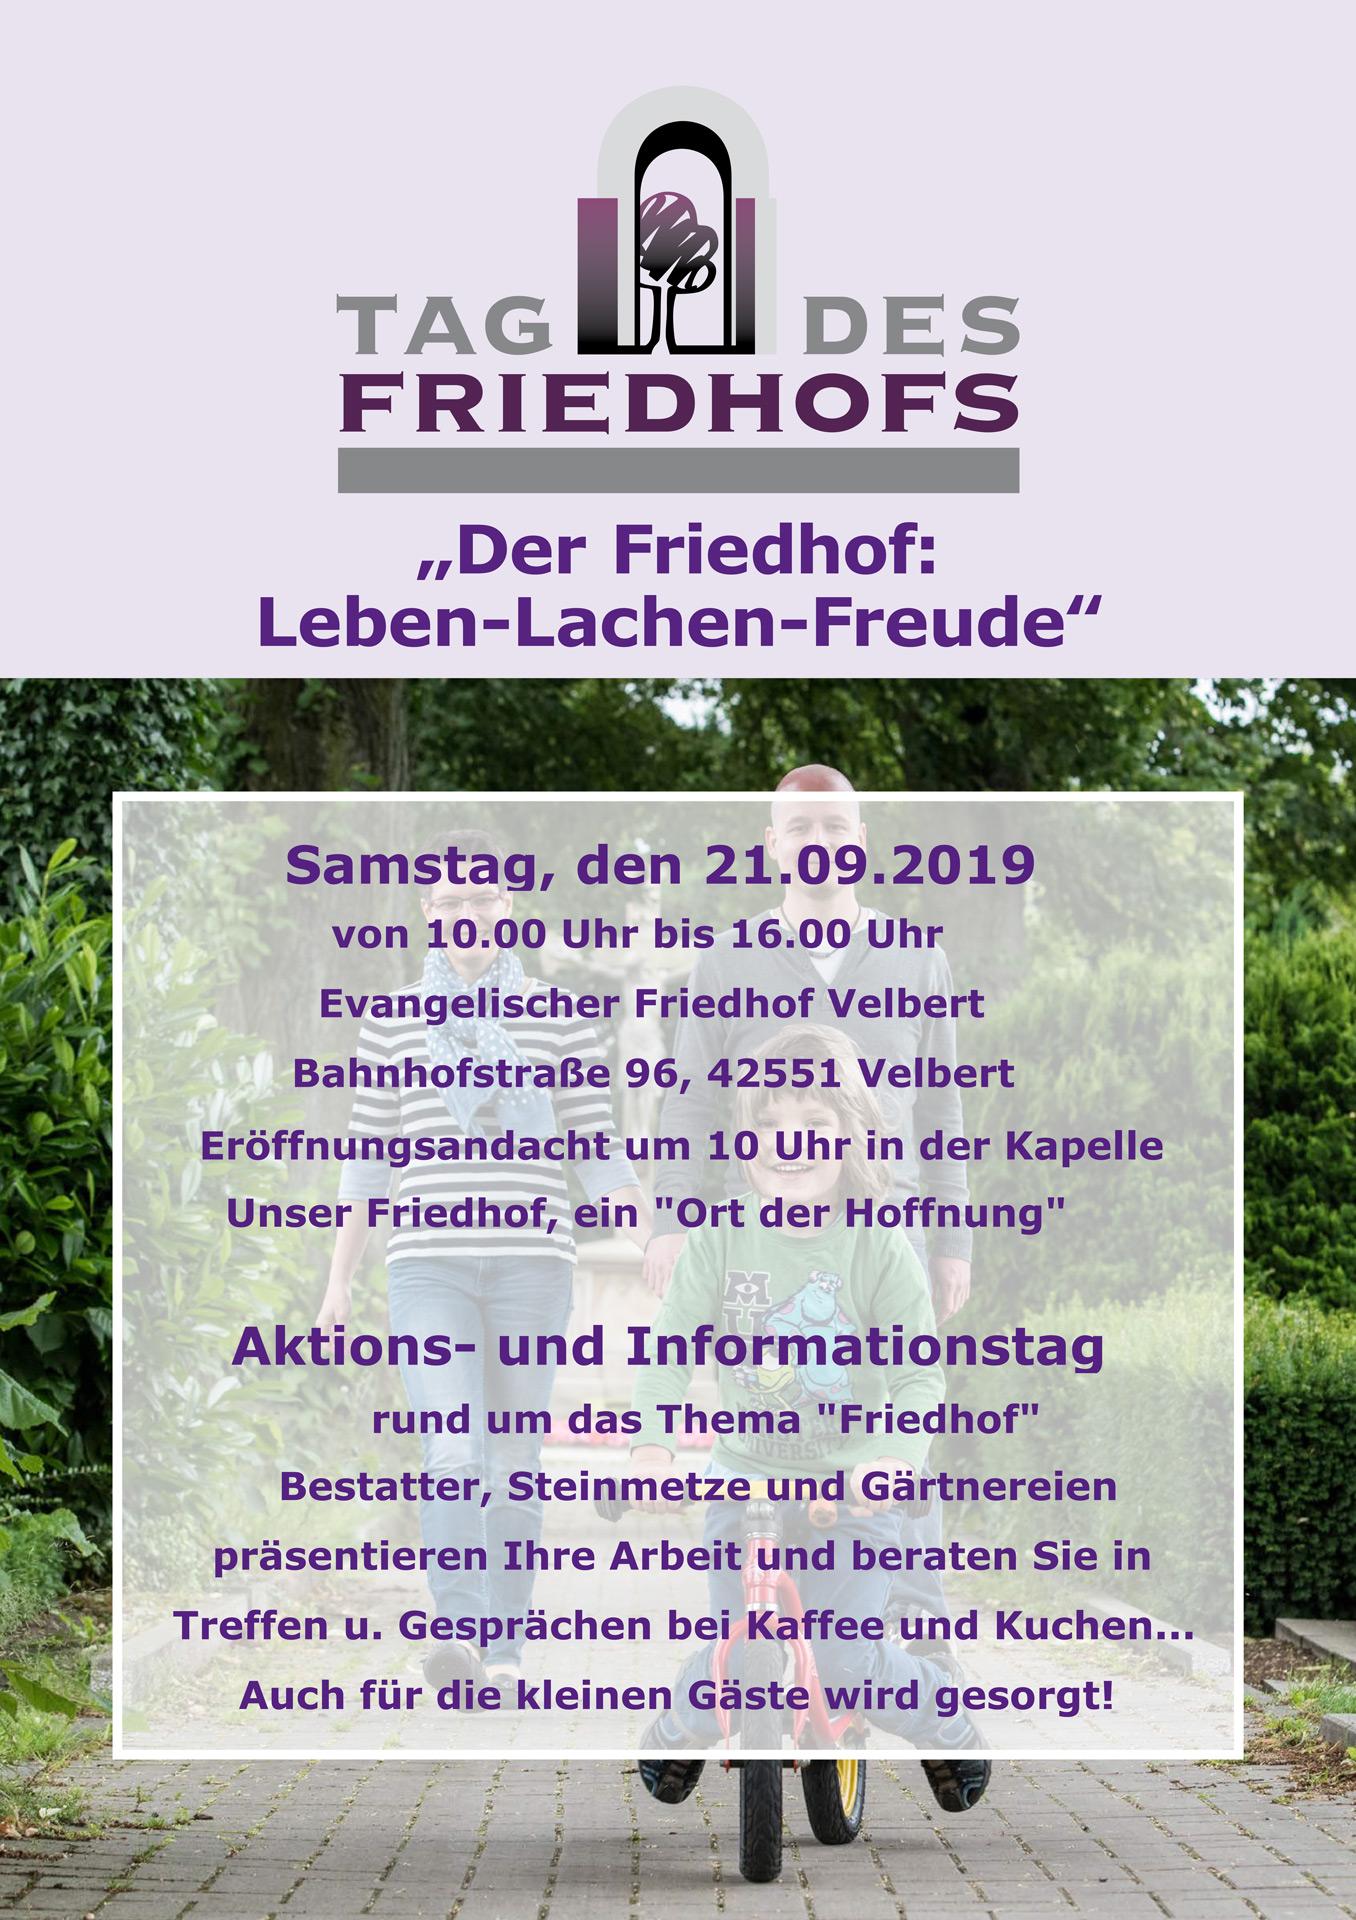 https://kirchengemeinde.evangelischer-friedhof.de/wp-content/uploads/2019/08/Plakat_Tag_des_Friedhofs_ohne_Datum_als_Formular-1.jpg